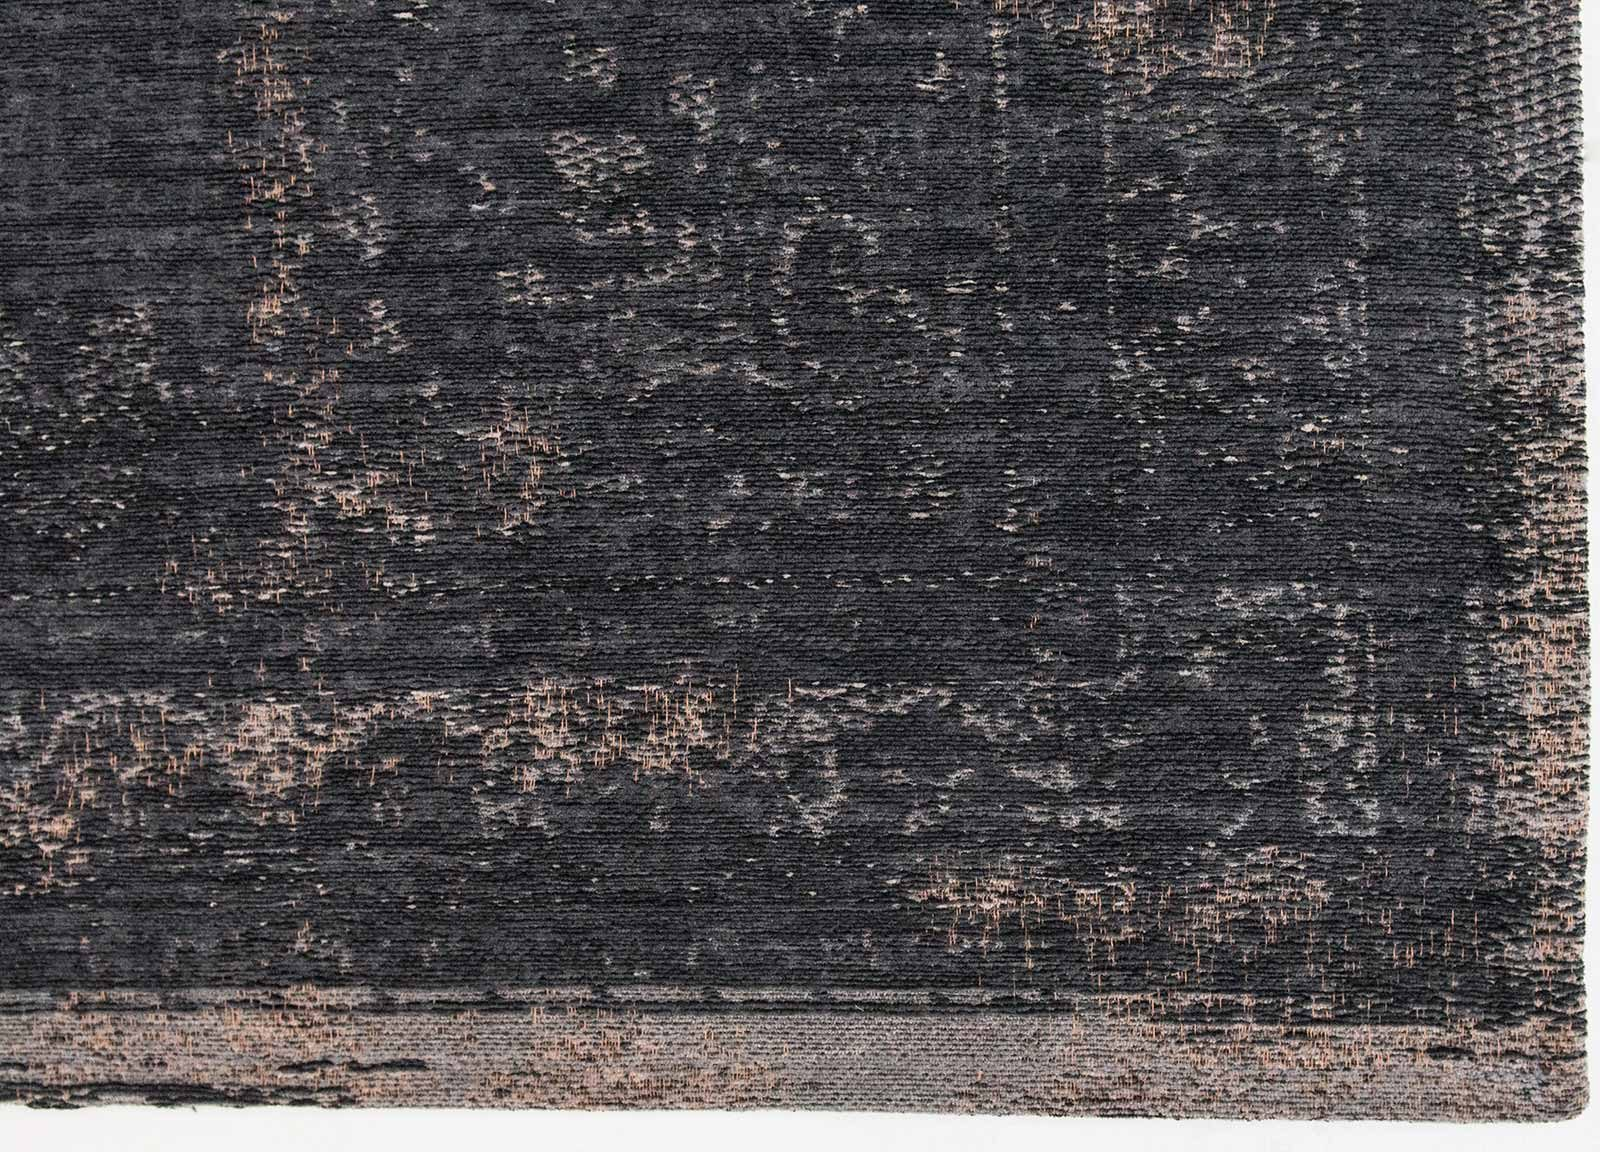 alfombras Louis De Poortere LX8263 Fading World Medaillon Mineral Black corner